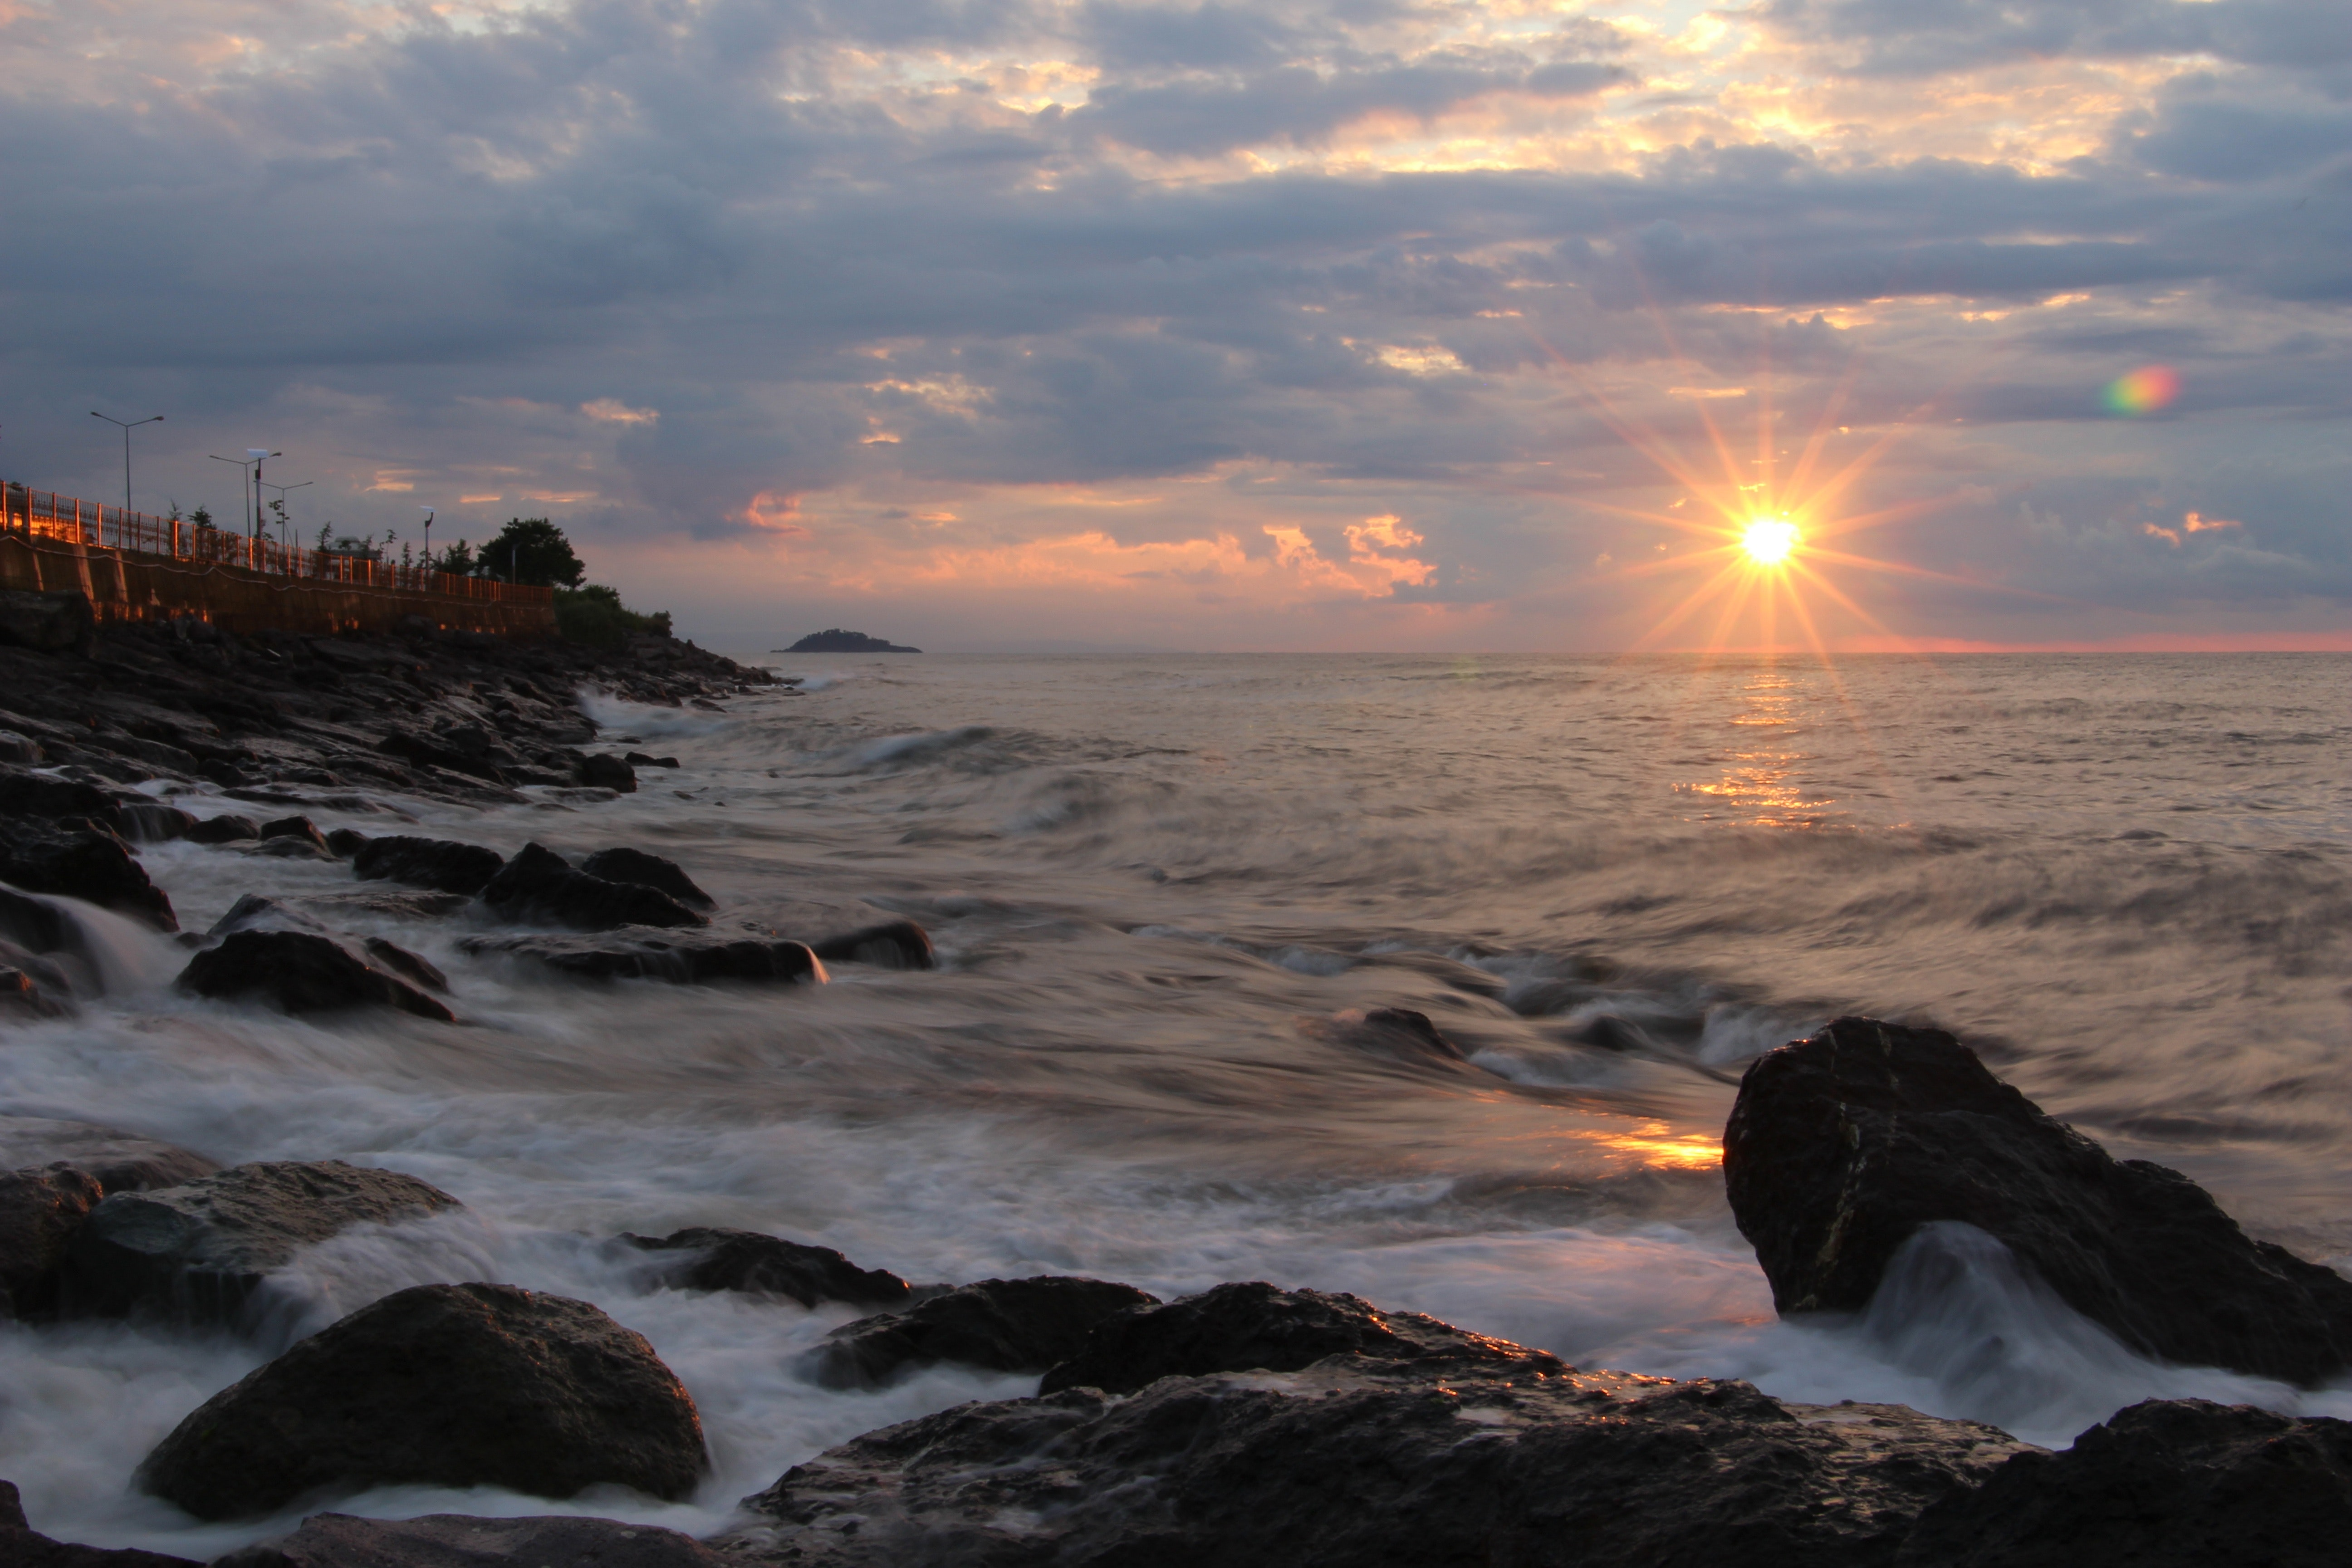 Rocks on seashore during sunset photo